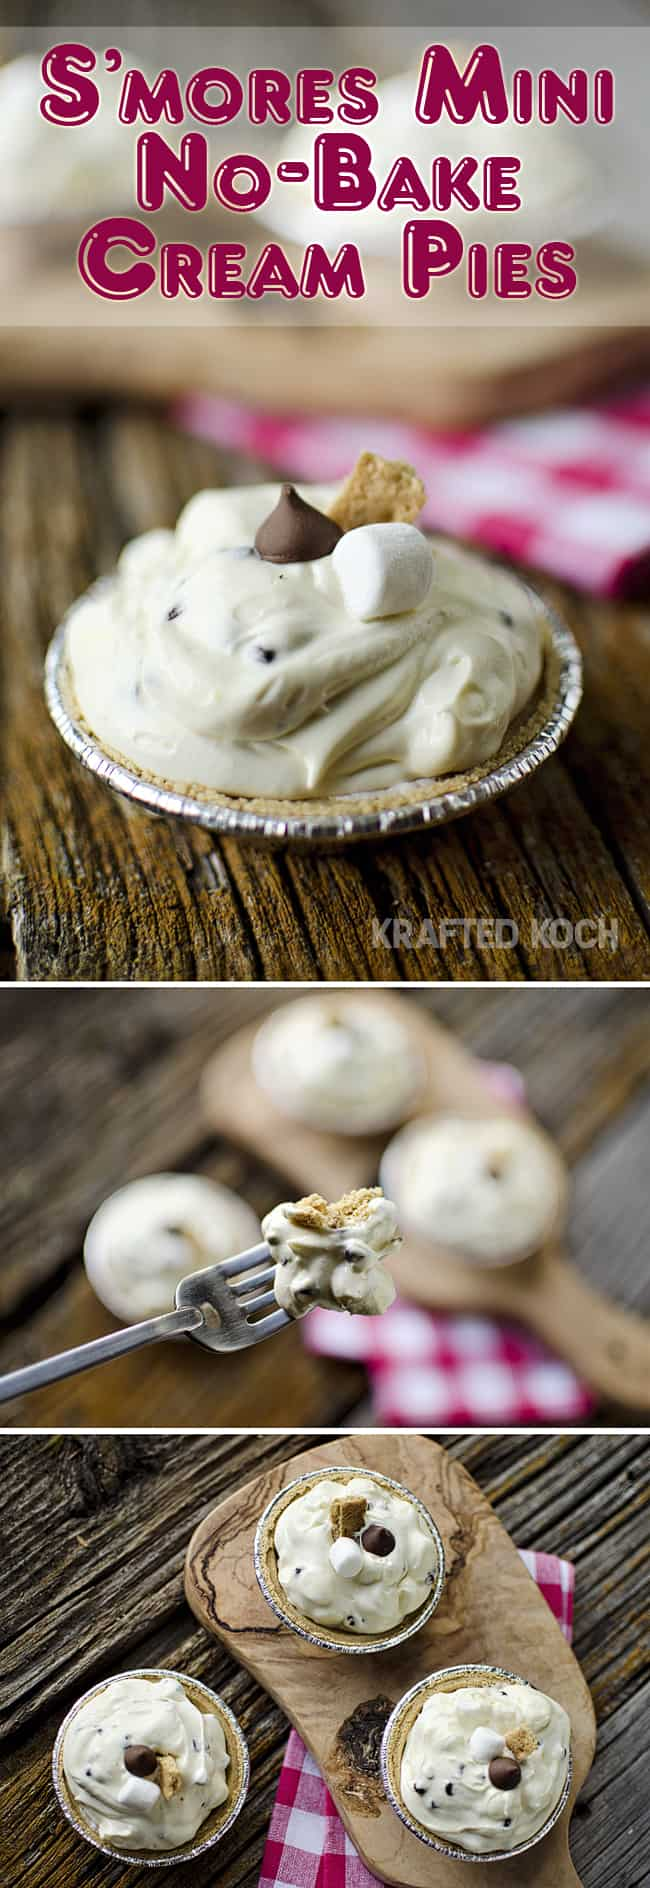 S'mores Mini No-Bake Cream Pies - Krafted Koch